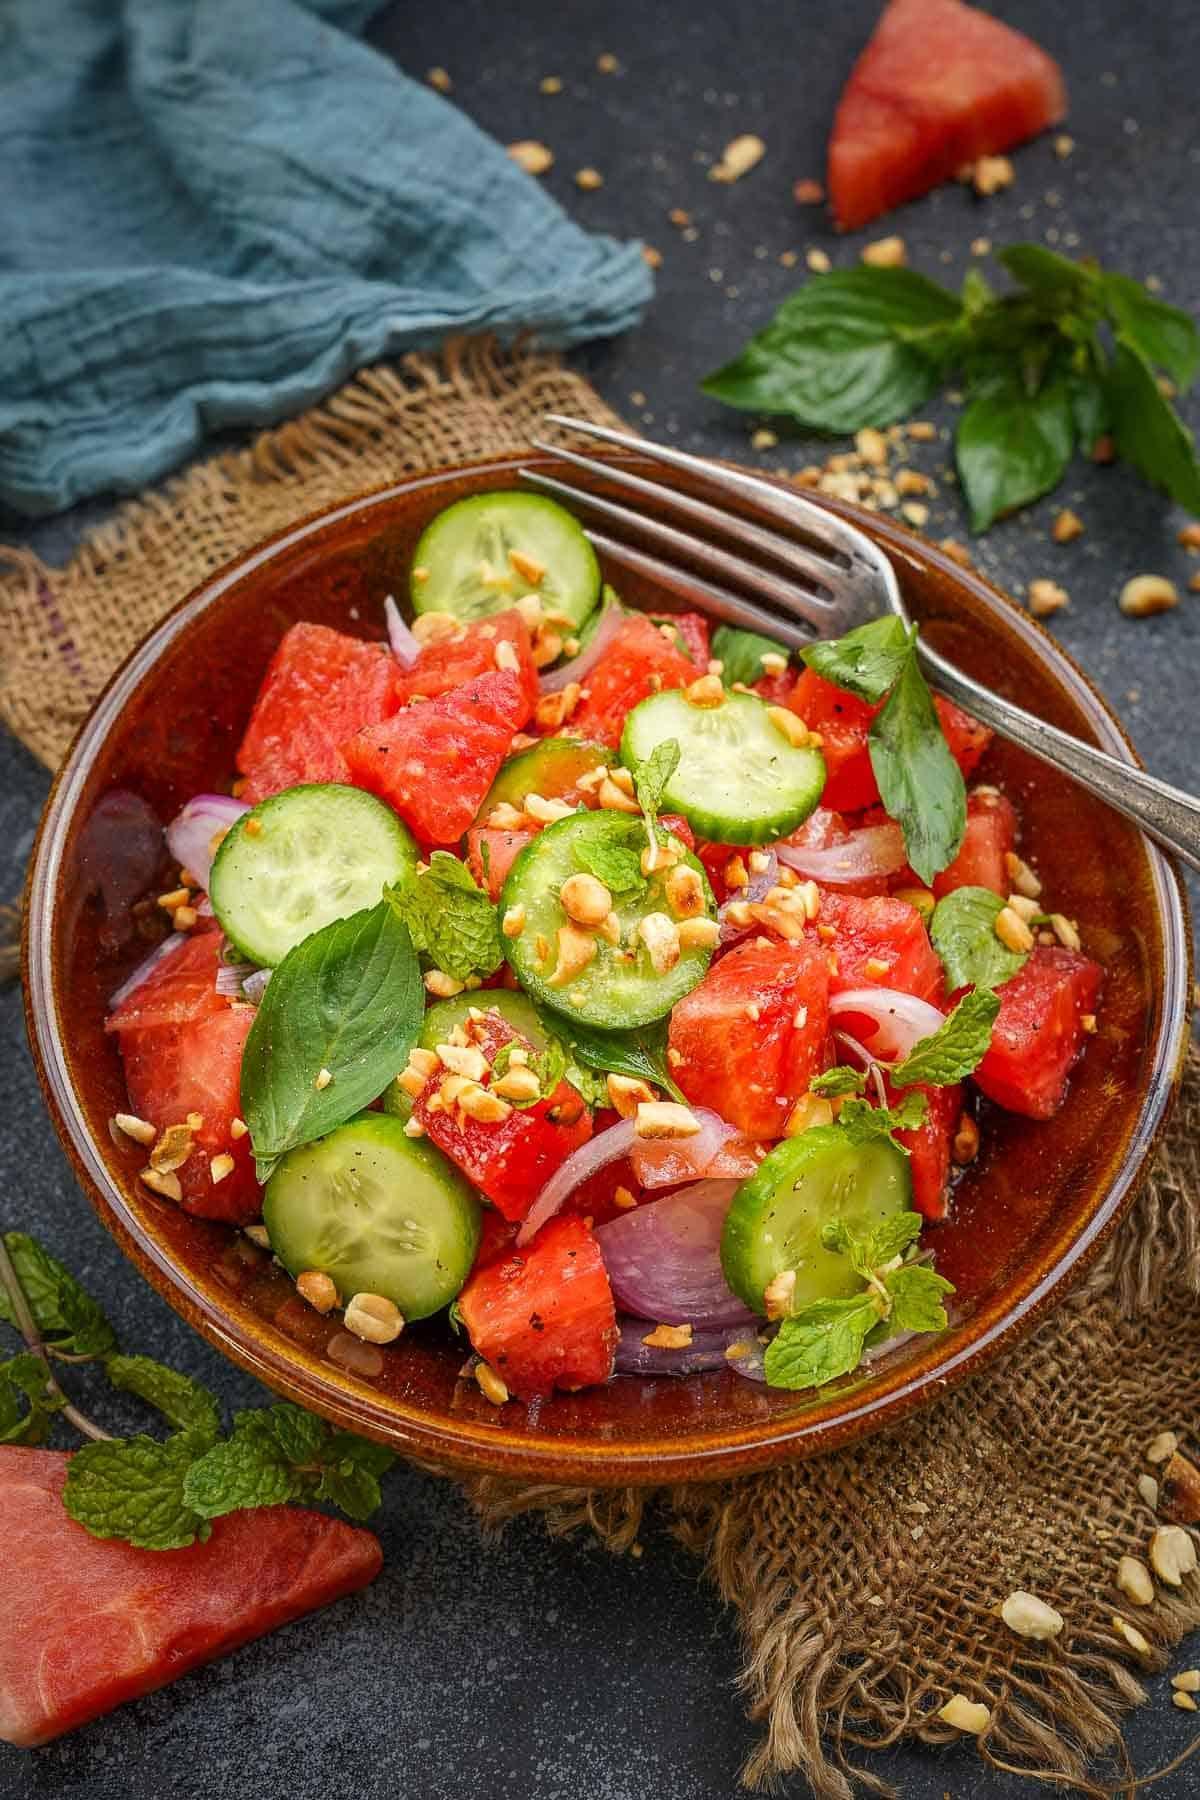 Thai Watermelon Salad served in a bowl.